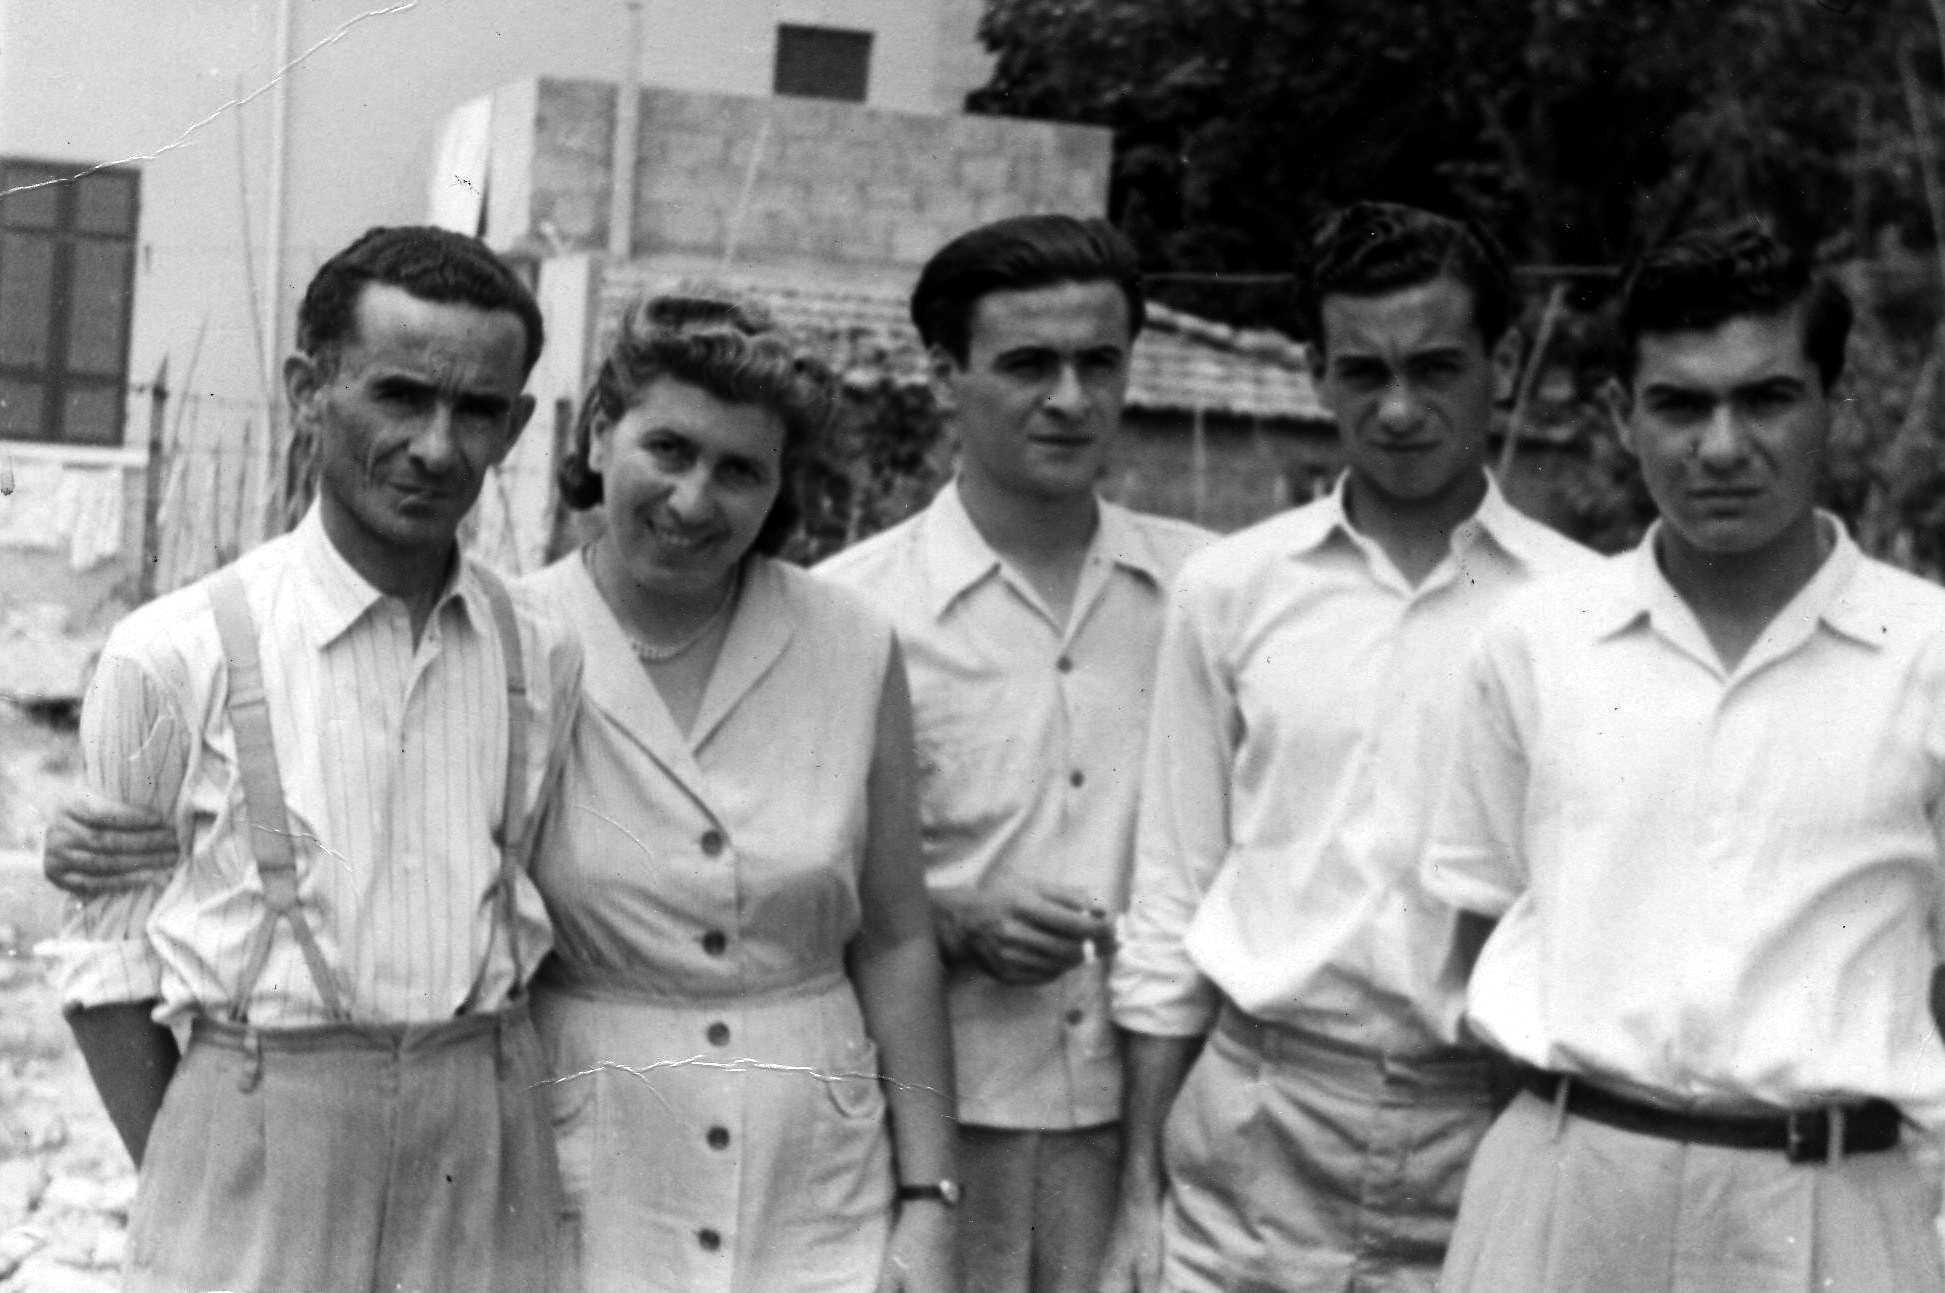 Attilio Bazzocchi, Manilla Gaudani i sos tres fills (Forlì, juliol de 1954)